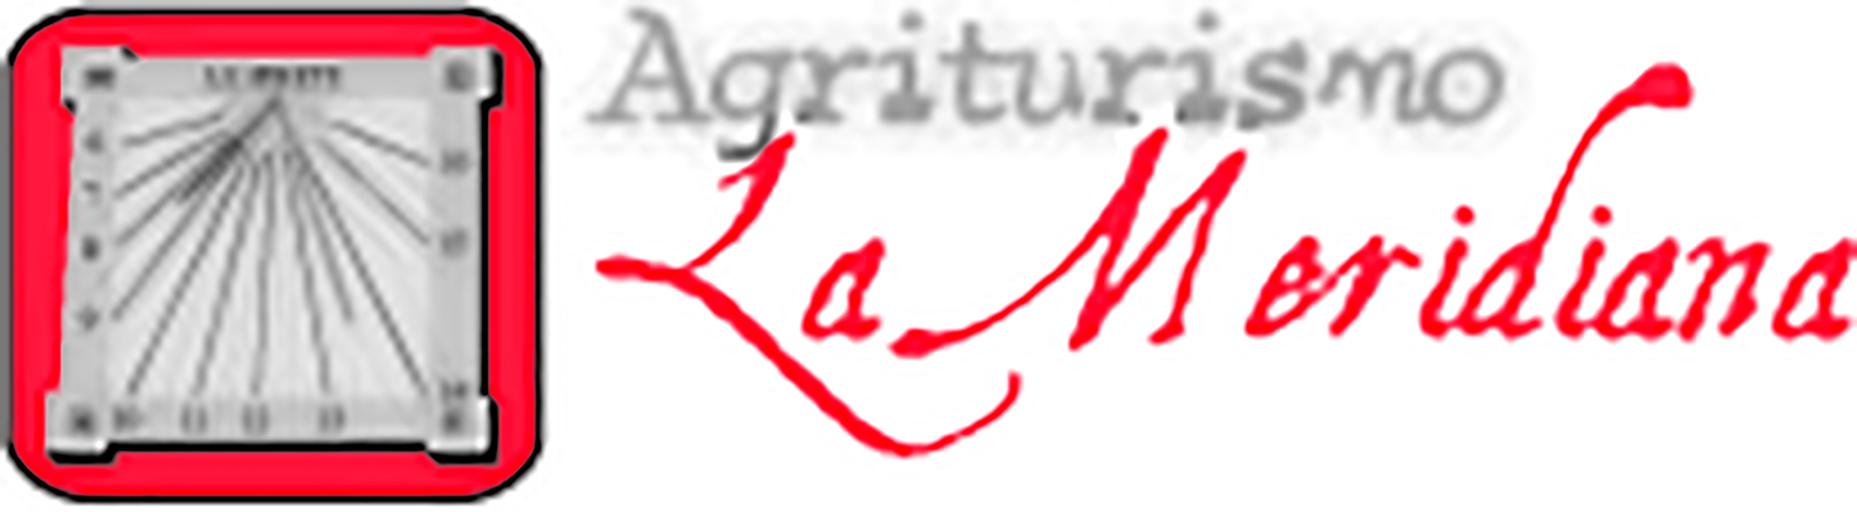 Agriturismo B&B La Meridiana Guidonia Tivoli